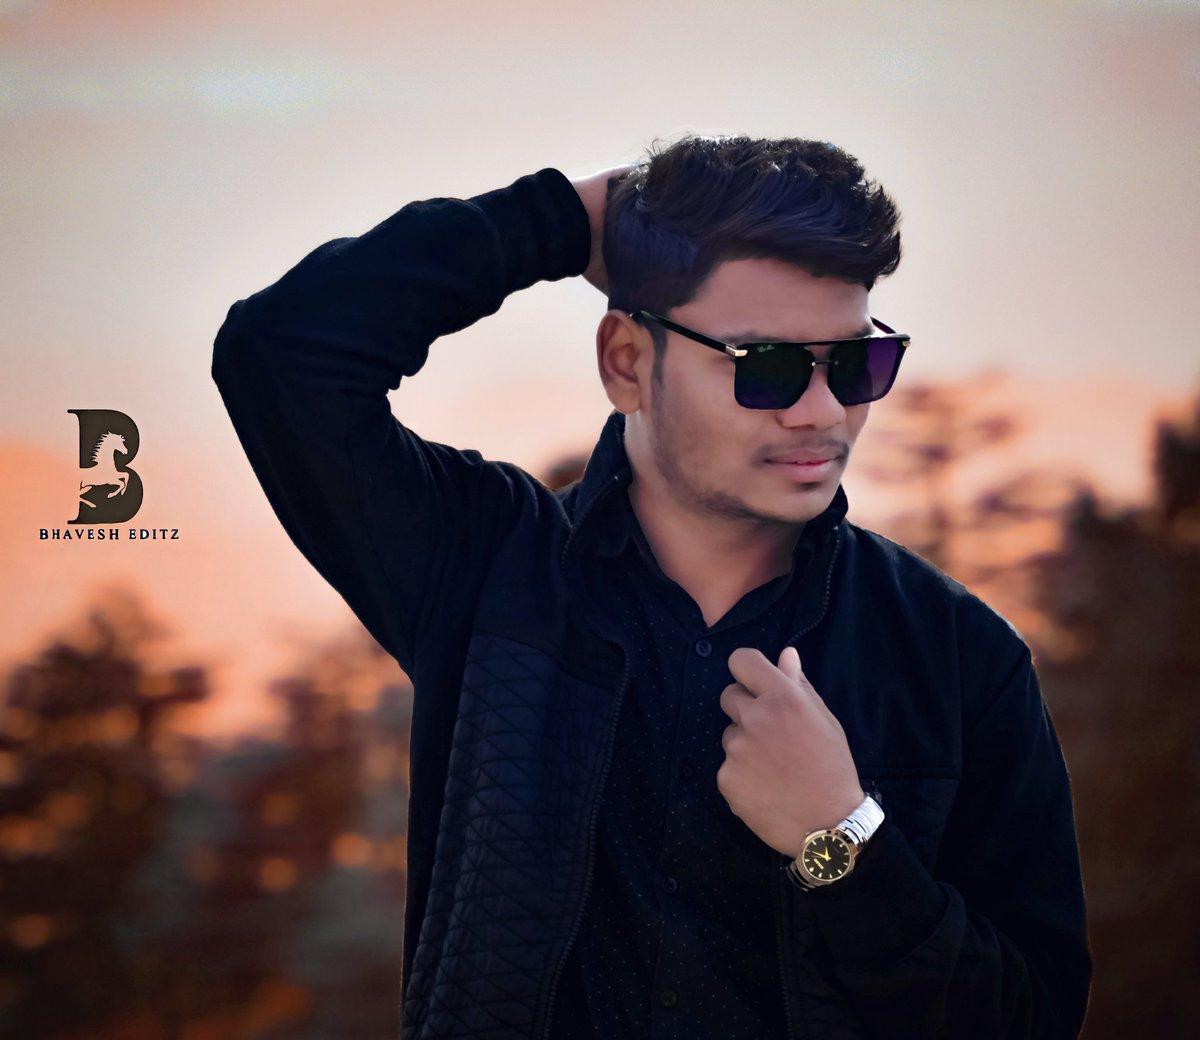 #like #likefollow #likeforlikes #follow #likes #likesforlike #amazing #likeforfollow #likesforlikesback #likeforlike #likeitup #likelike #likeforlikeback #likeforlikeandfollow #likers #instalike #lfl #followforfollowback #photo #photography #tamil #life #followforfollow #liker